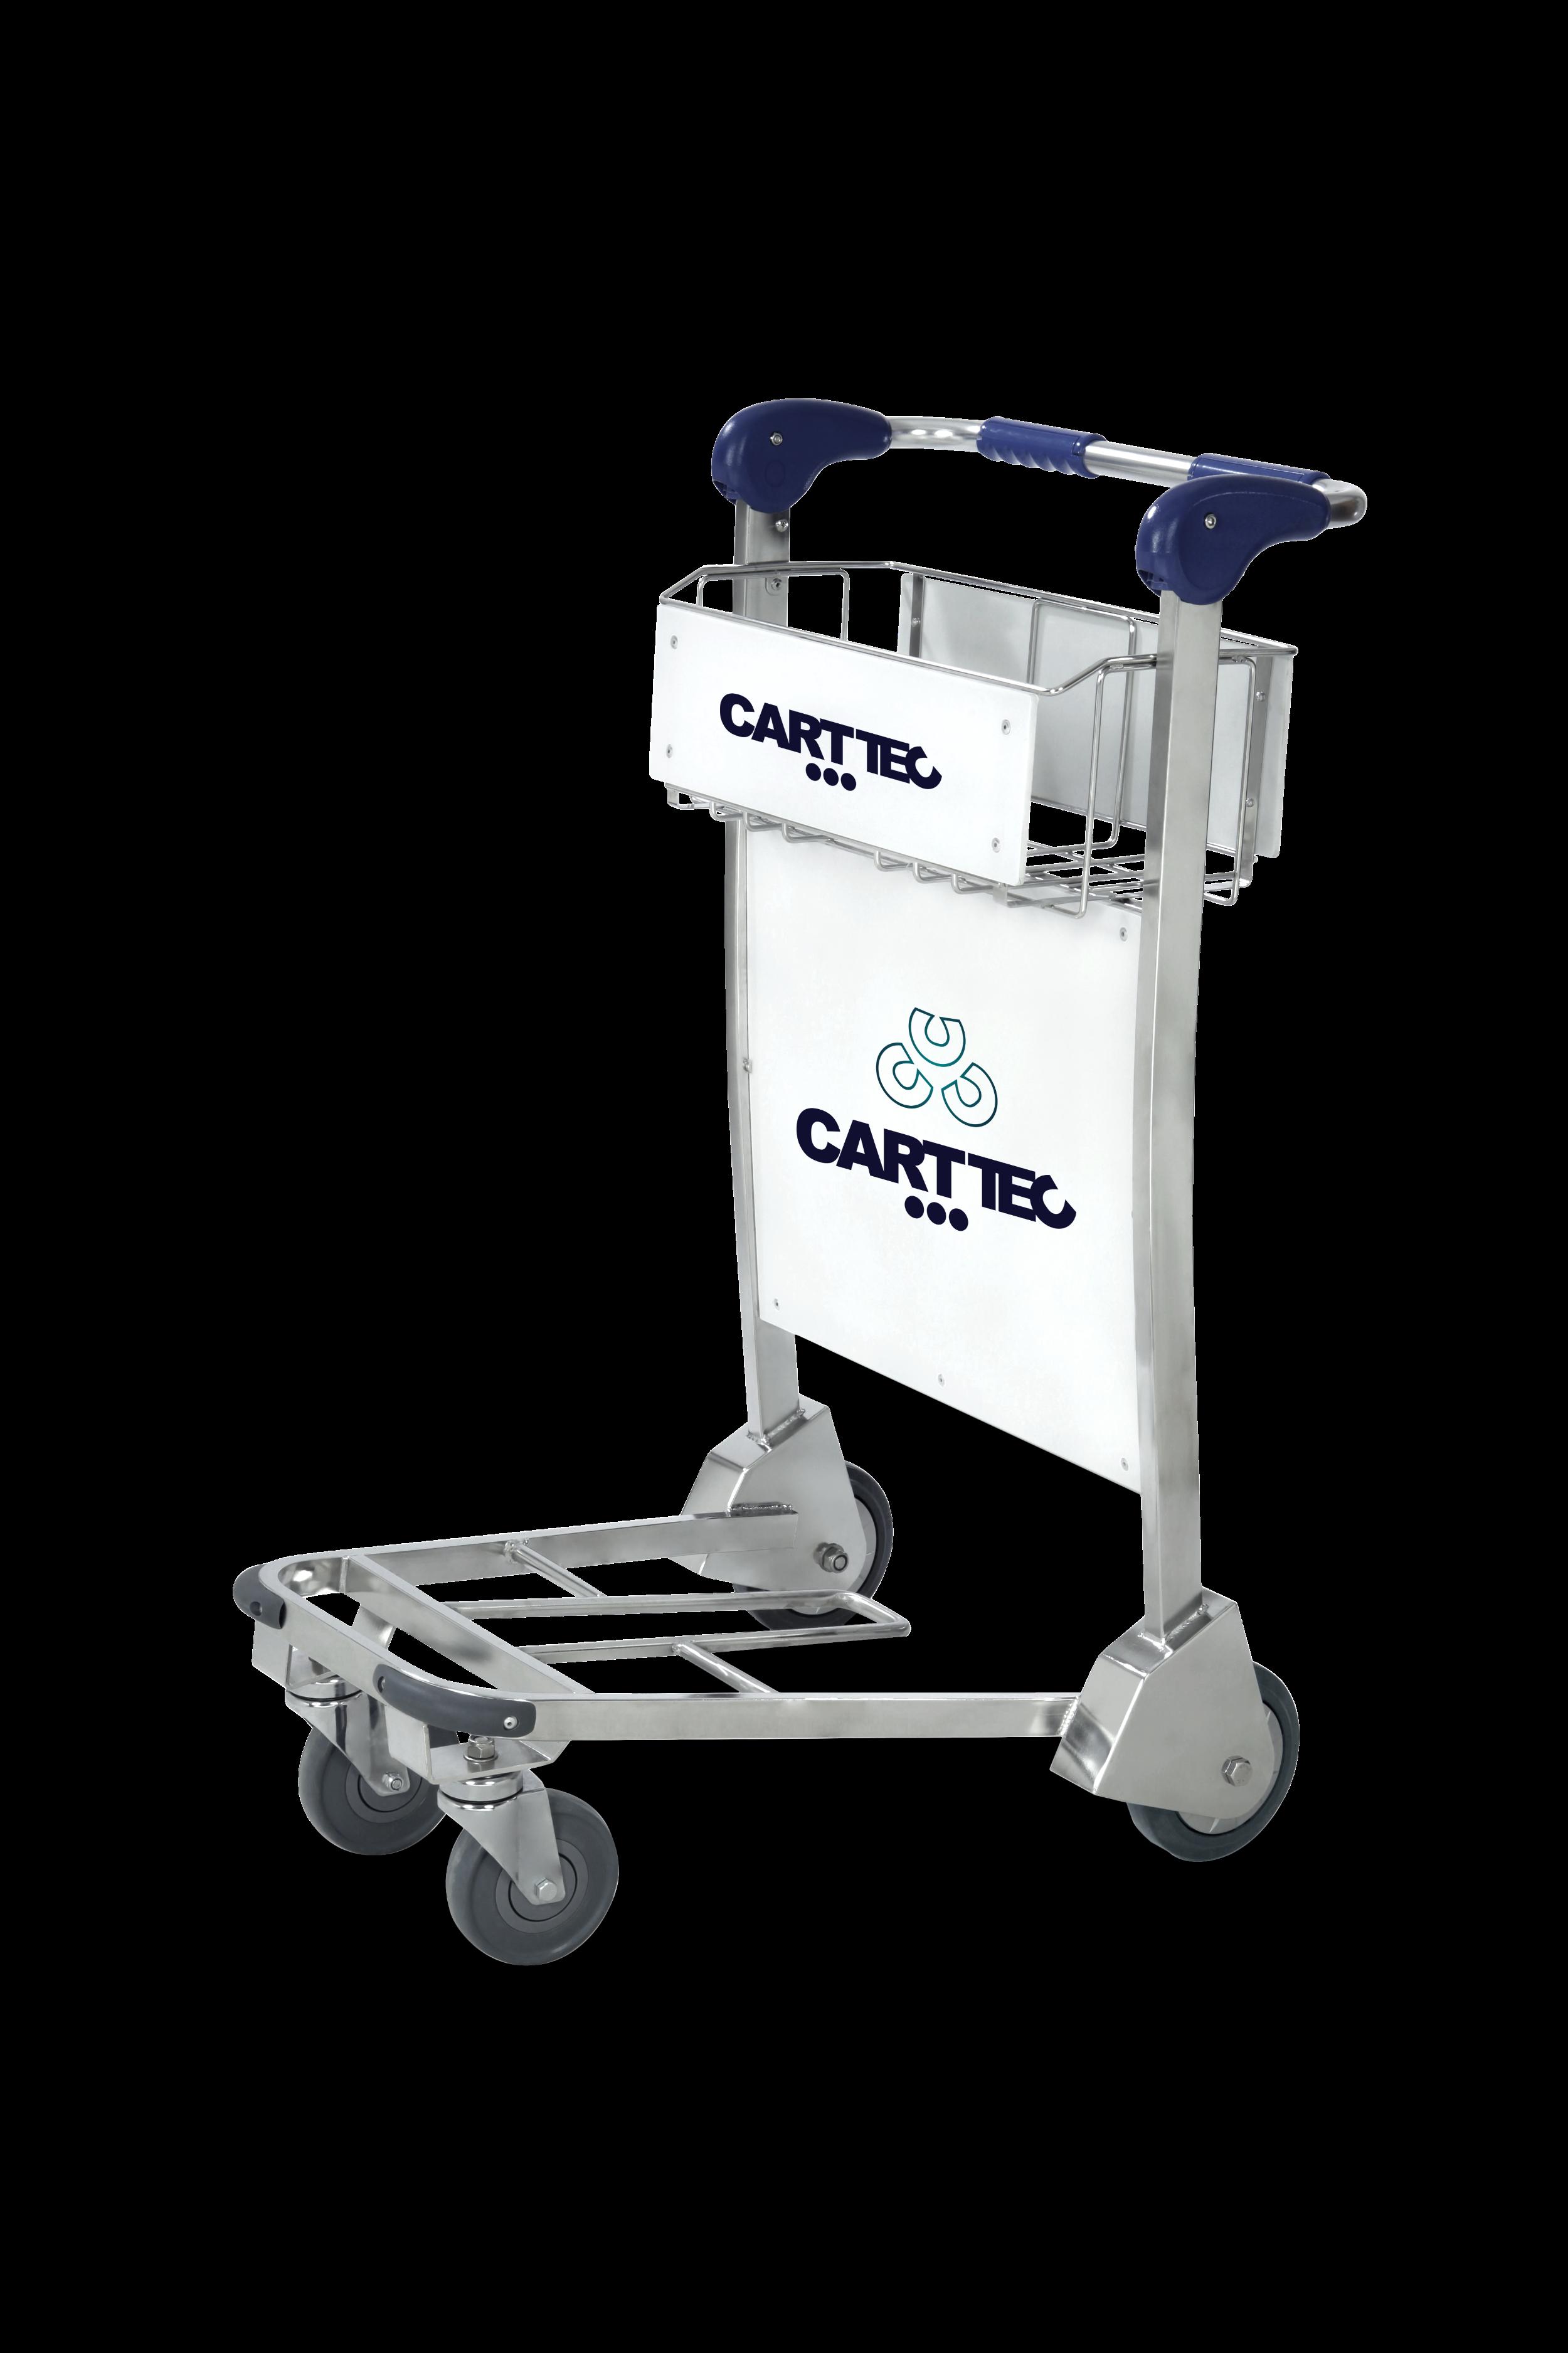 Carro portaequipaje para aeropuerto CARTTEC CARTT4100 861d07f55a9b